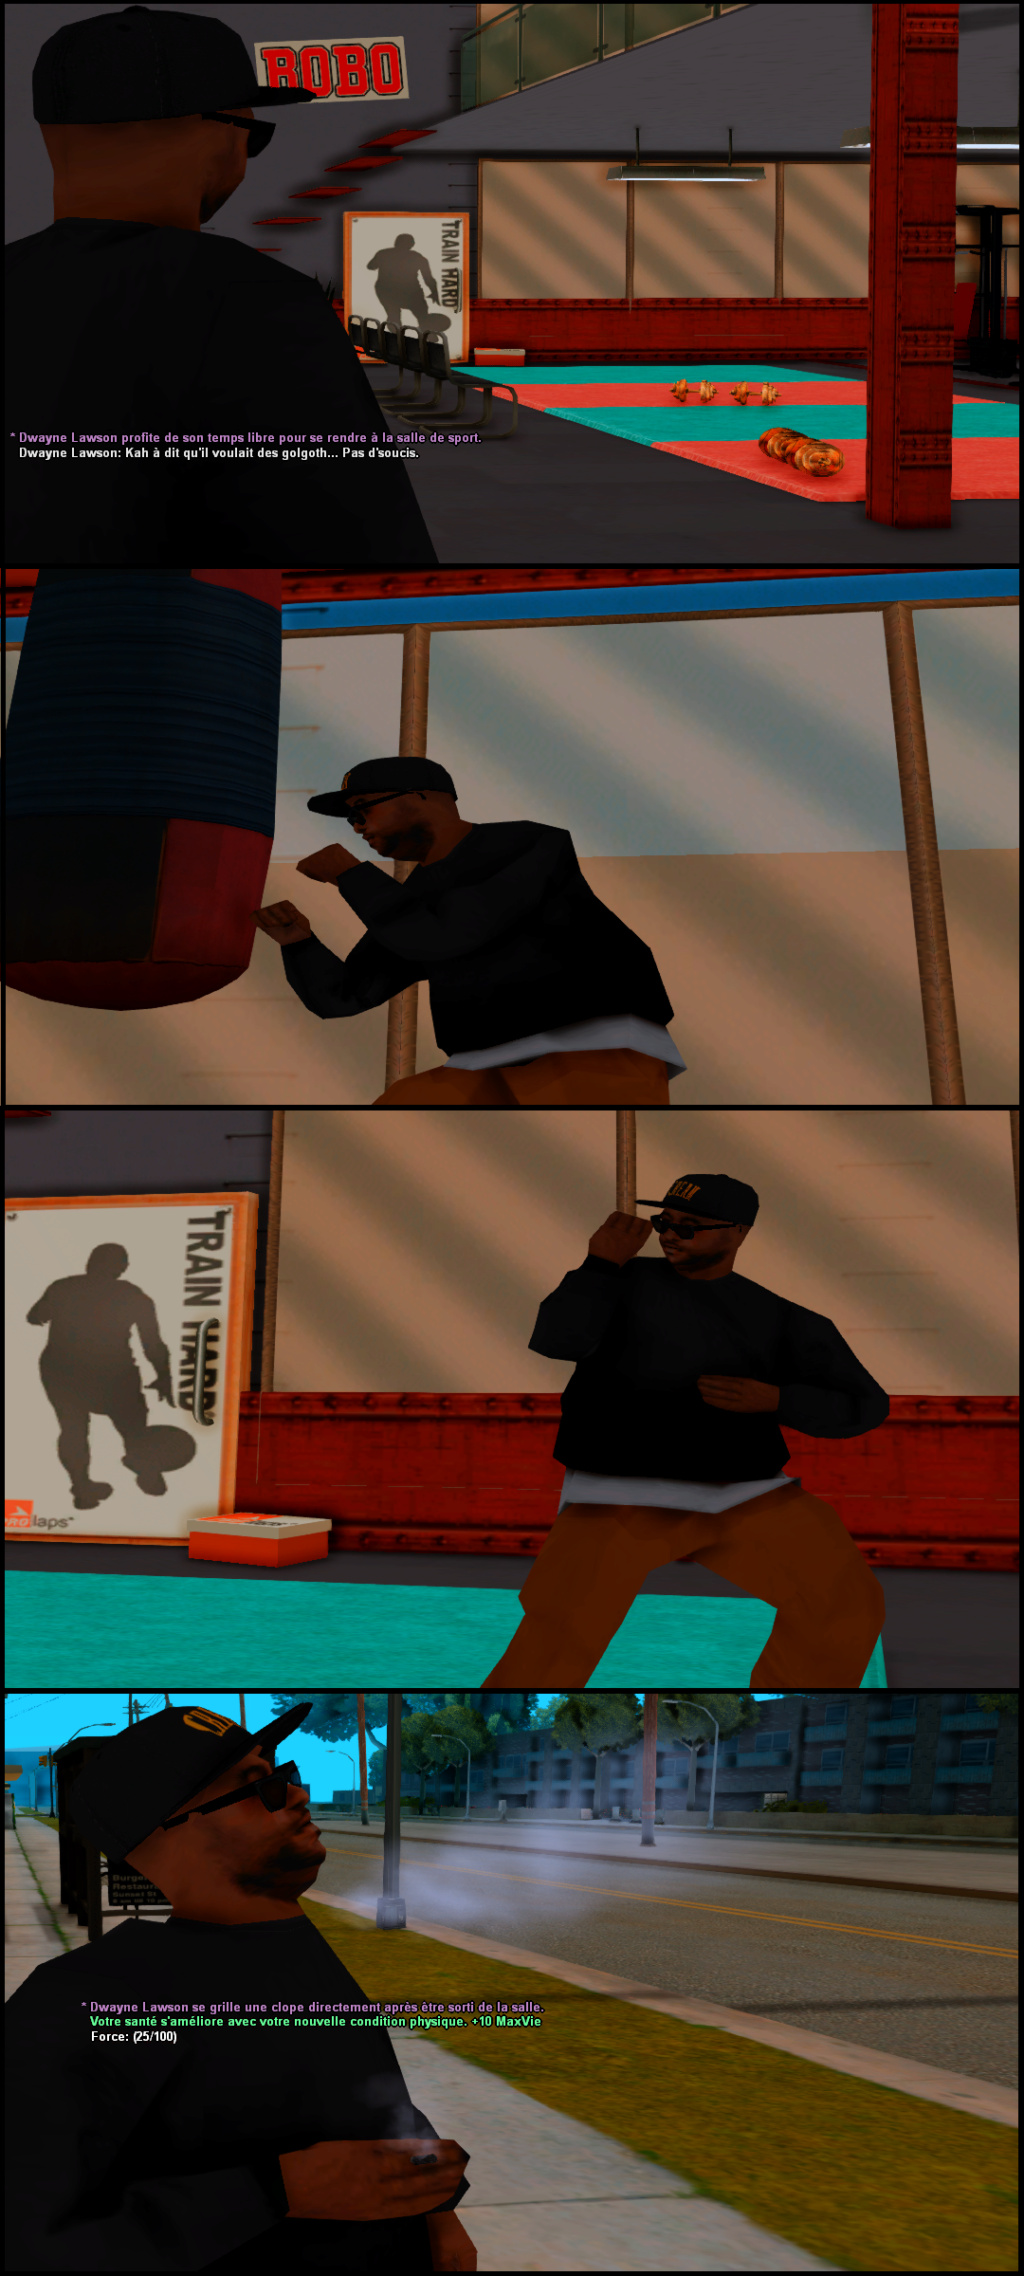 (PED) (GANG) Grove Street Mafia Crips - Page 13 Screen11